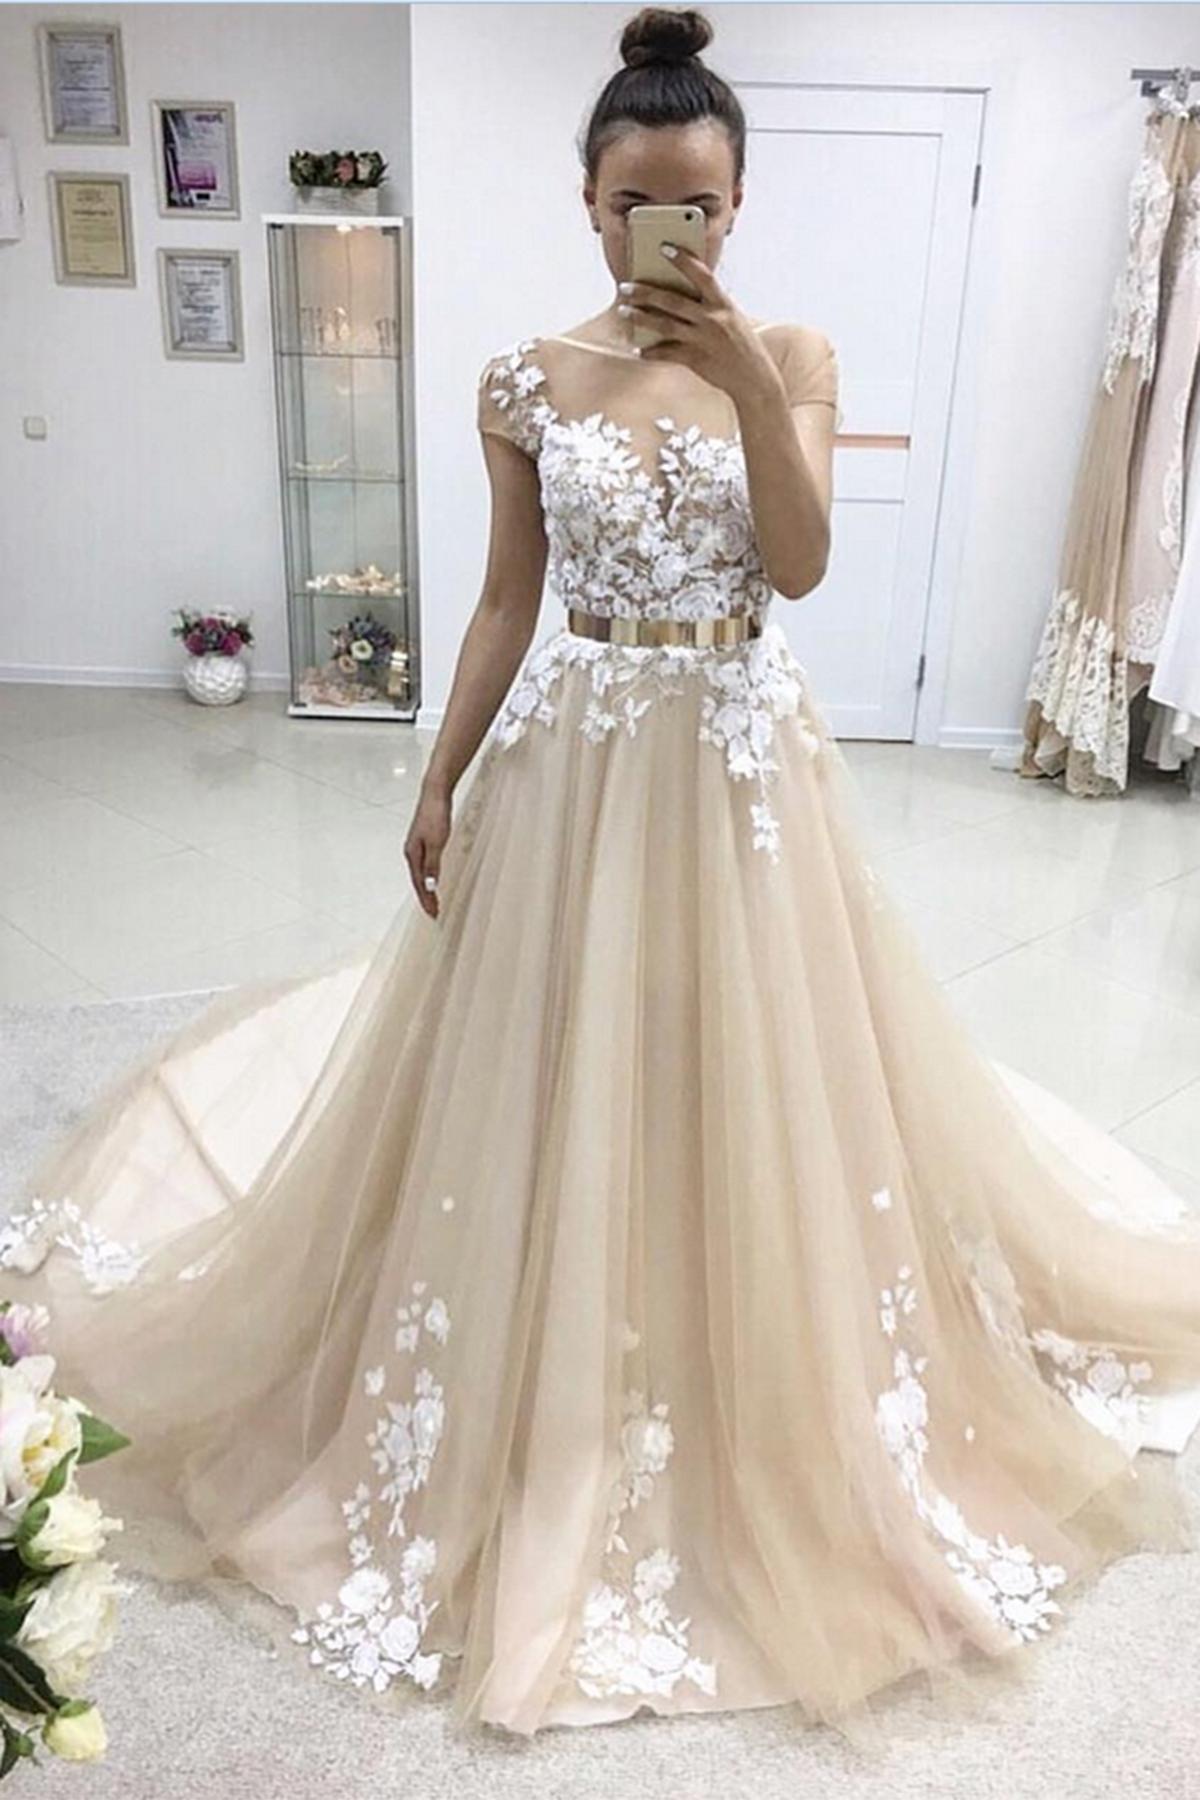 Image of 2018 spring A-line long short sleeves senior prom dresses with gold belt